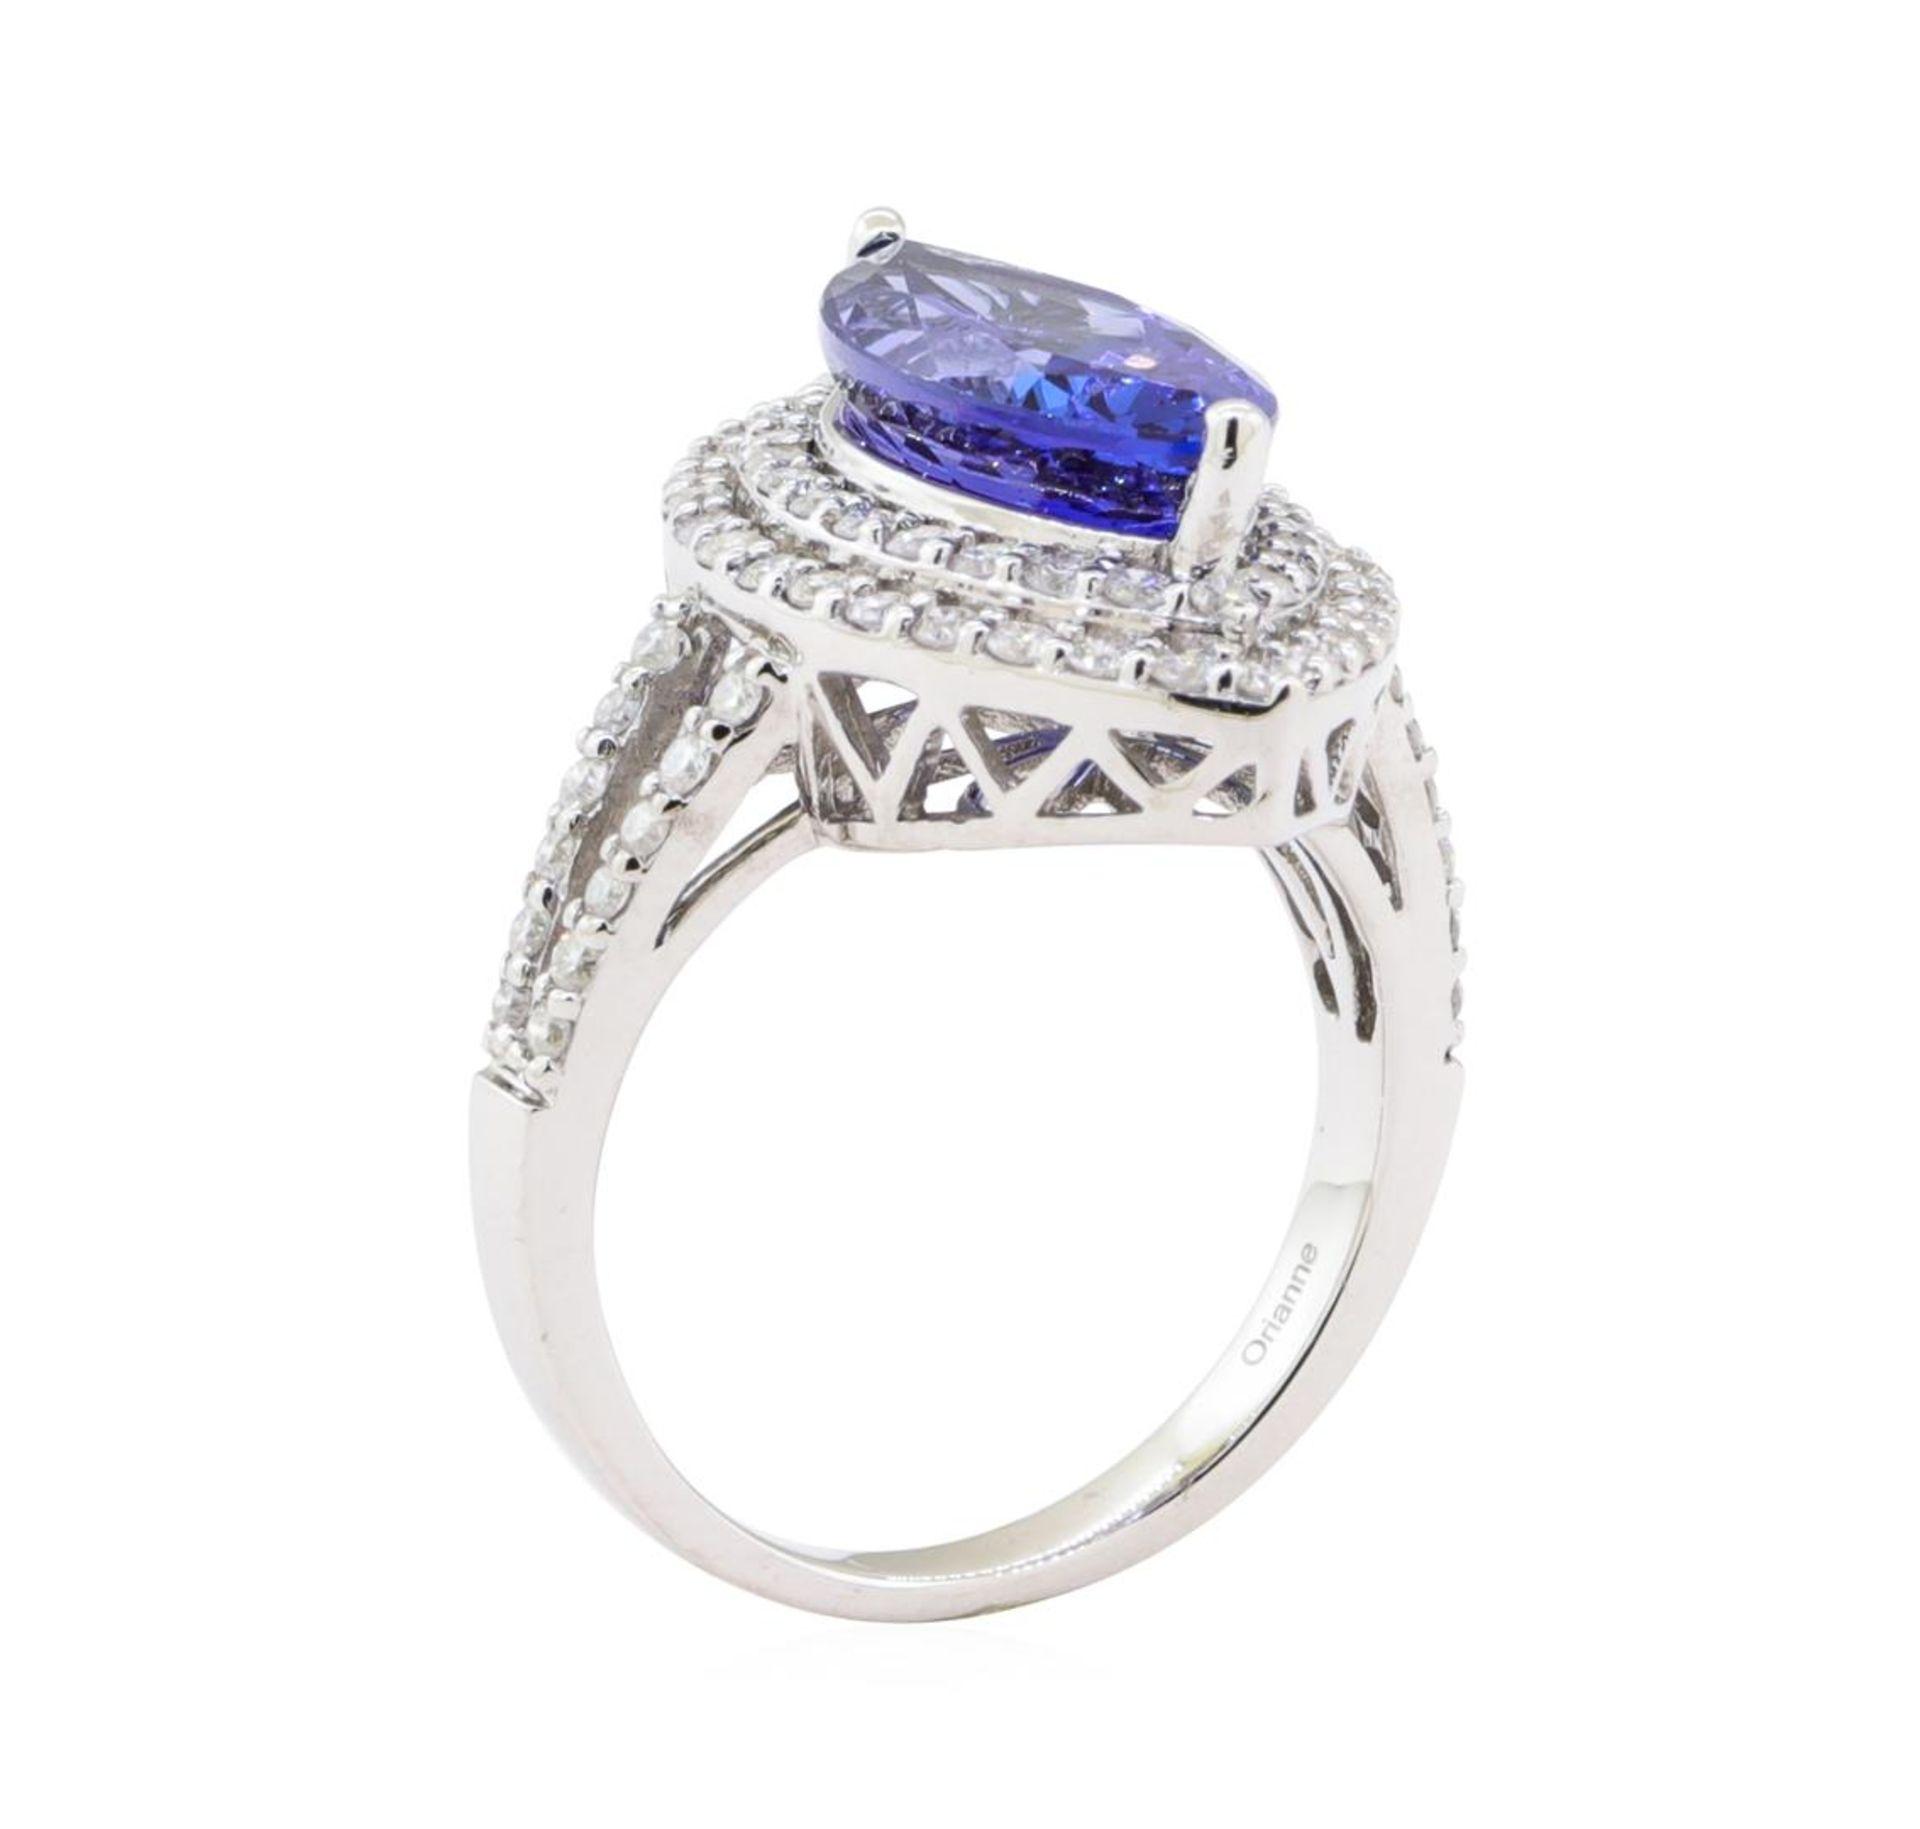 4.17ct Tanzanite and Diamond Ring - 14KT White Gold - Image 4 of 4